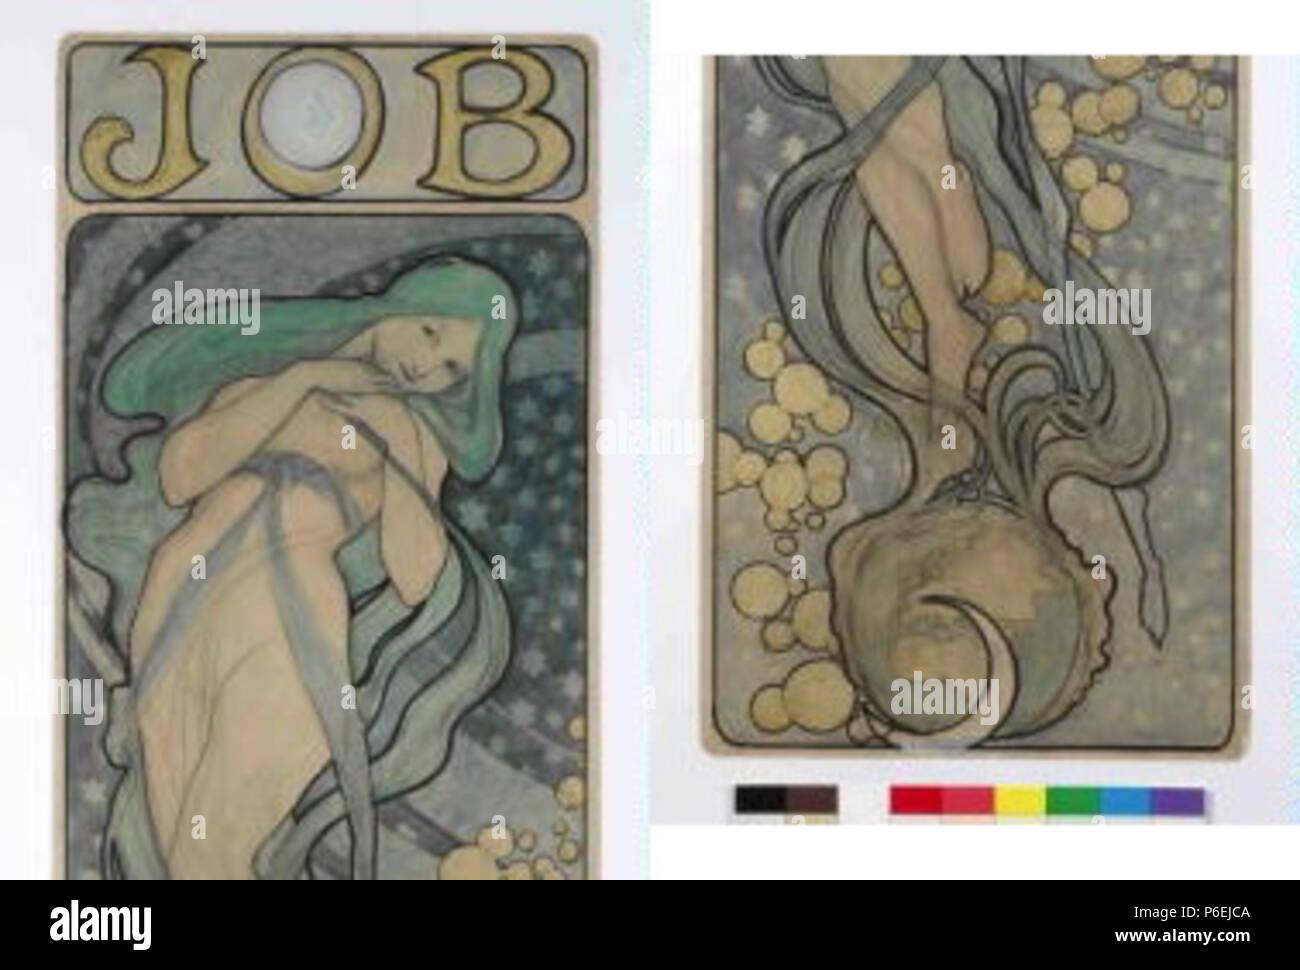 .: Na plakát eština Návrh trabajo circa 1897 6 Autor Alfons Mucha 24.7.1860-14.7.1939 - Trabajo plakat Navrh na Foto de stock